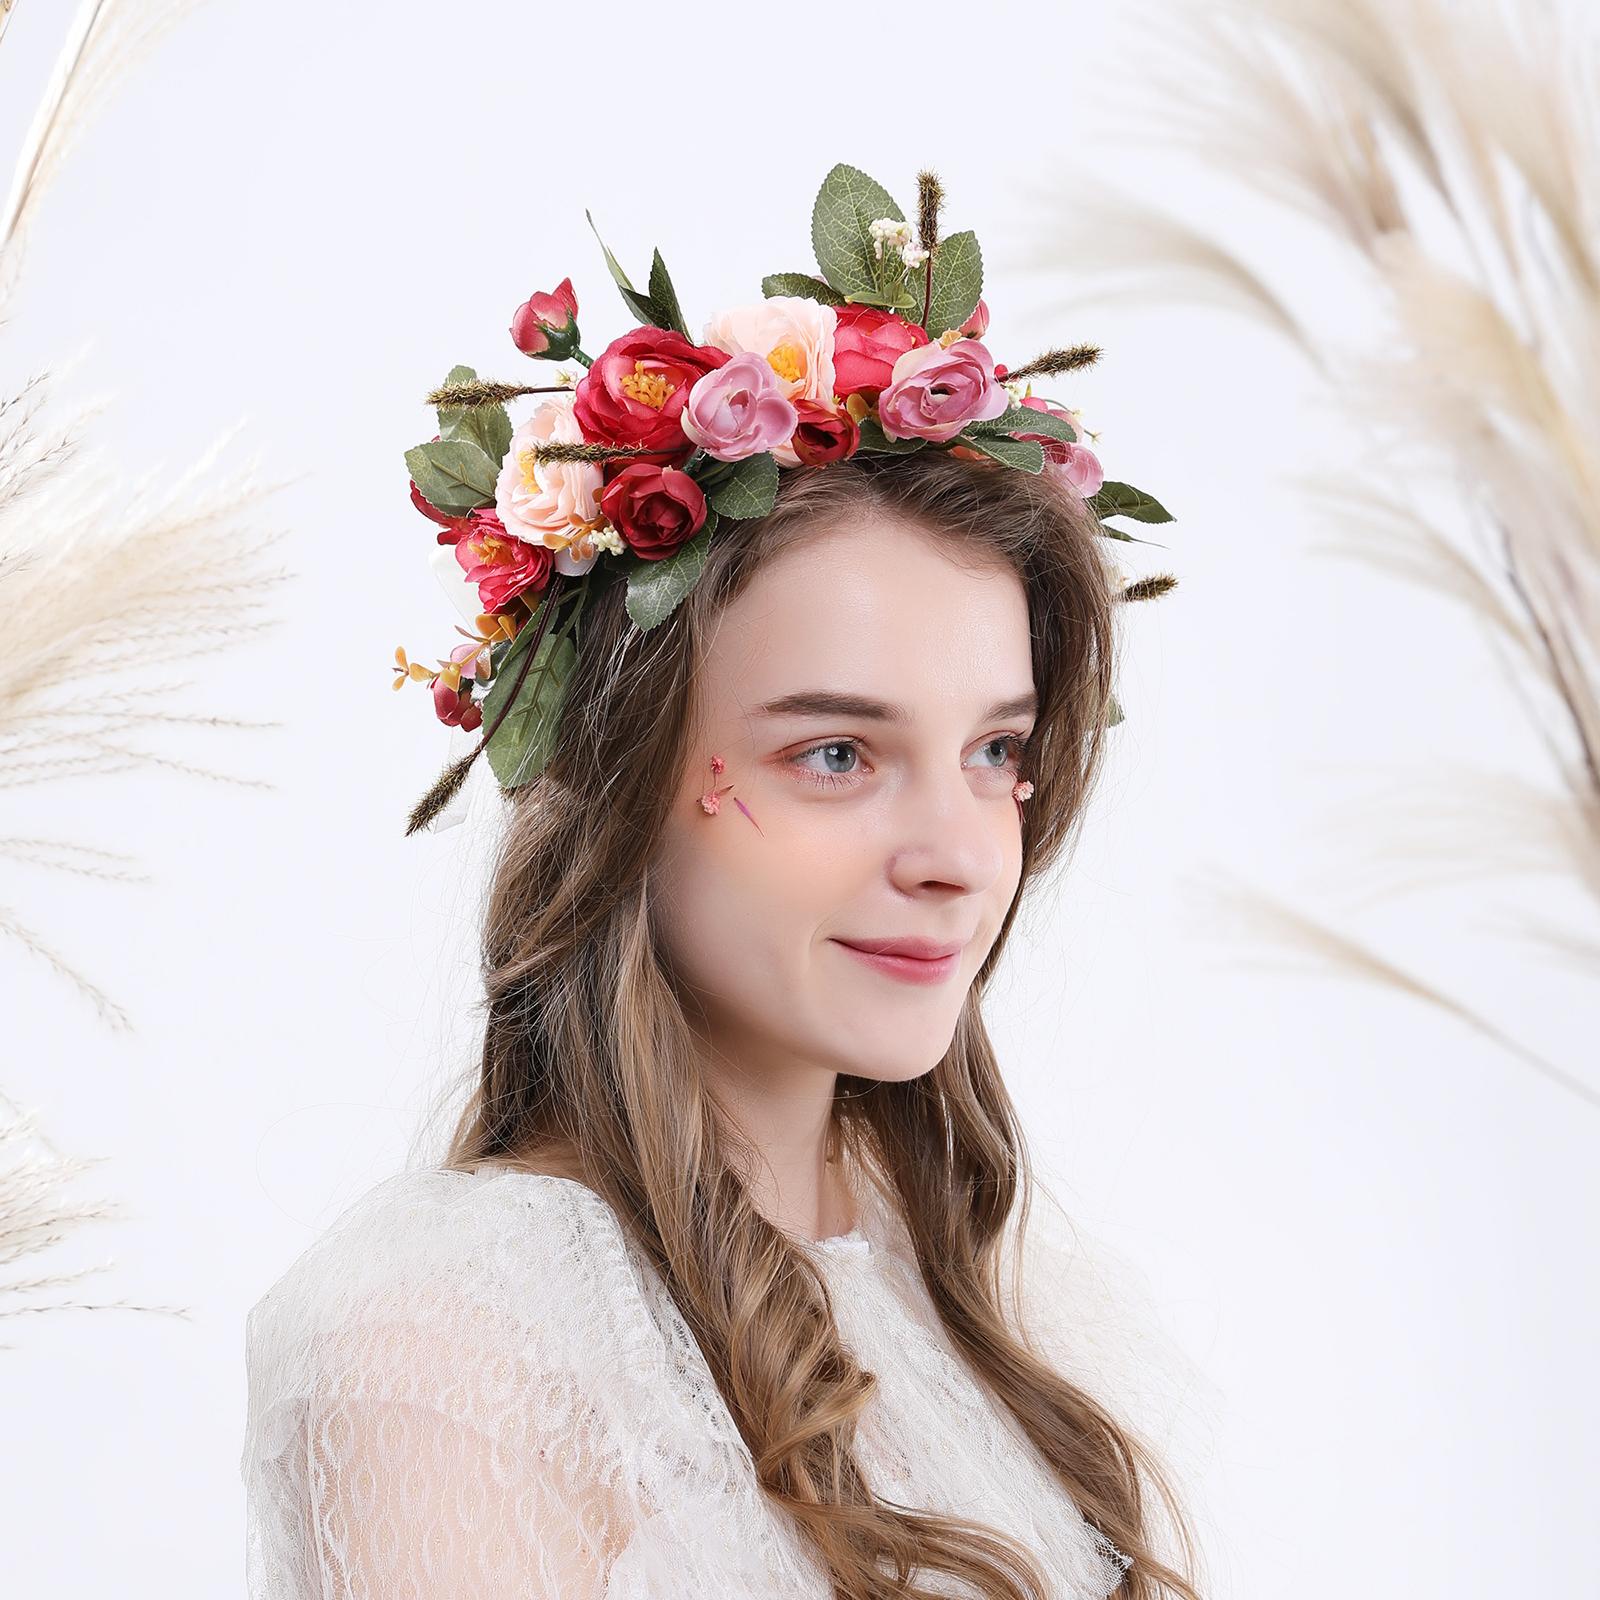 Fairy Party LED Rosebud Garland Flower Crown Headband Light Up Festival